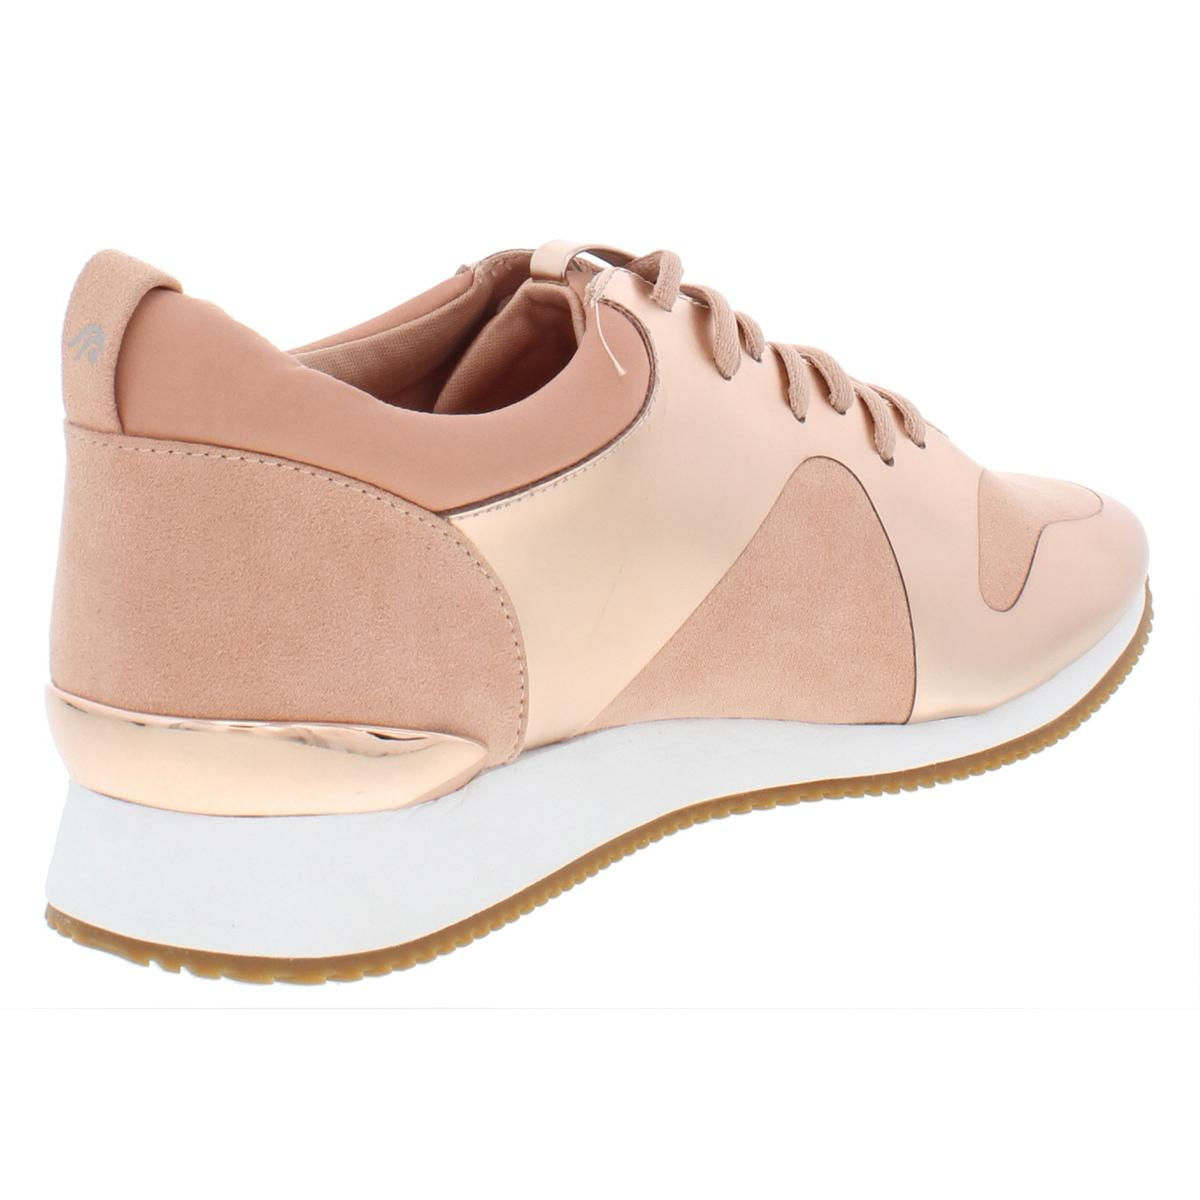 L-039-ideologie-Femme-Gabii-Daim-Trainer-Athletic-Fashion-Baskets-Chaussures-BHFO-5011 miniature 6